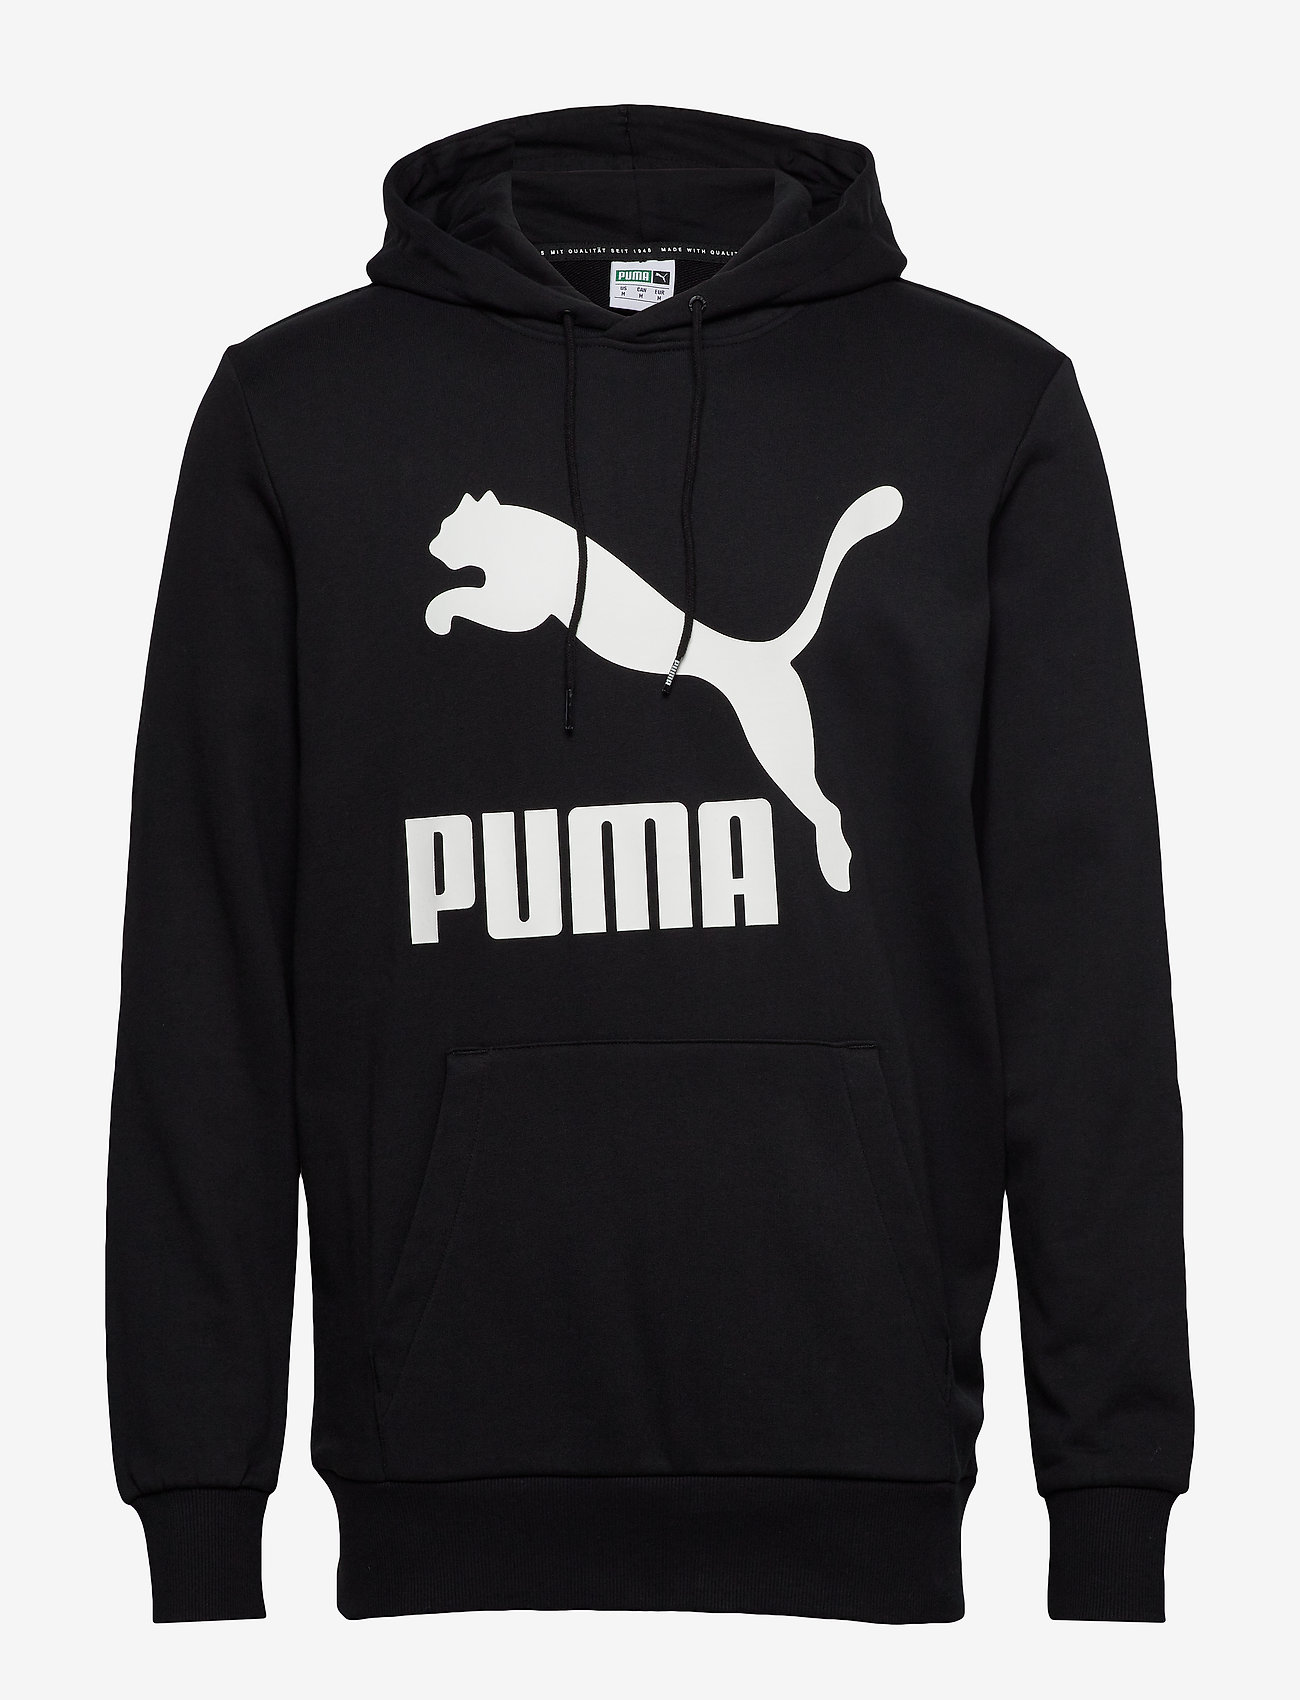 PUMA Classics Logo Hoody TR - Sweats PUMA BLACK 0Vwos9mY